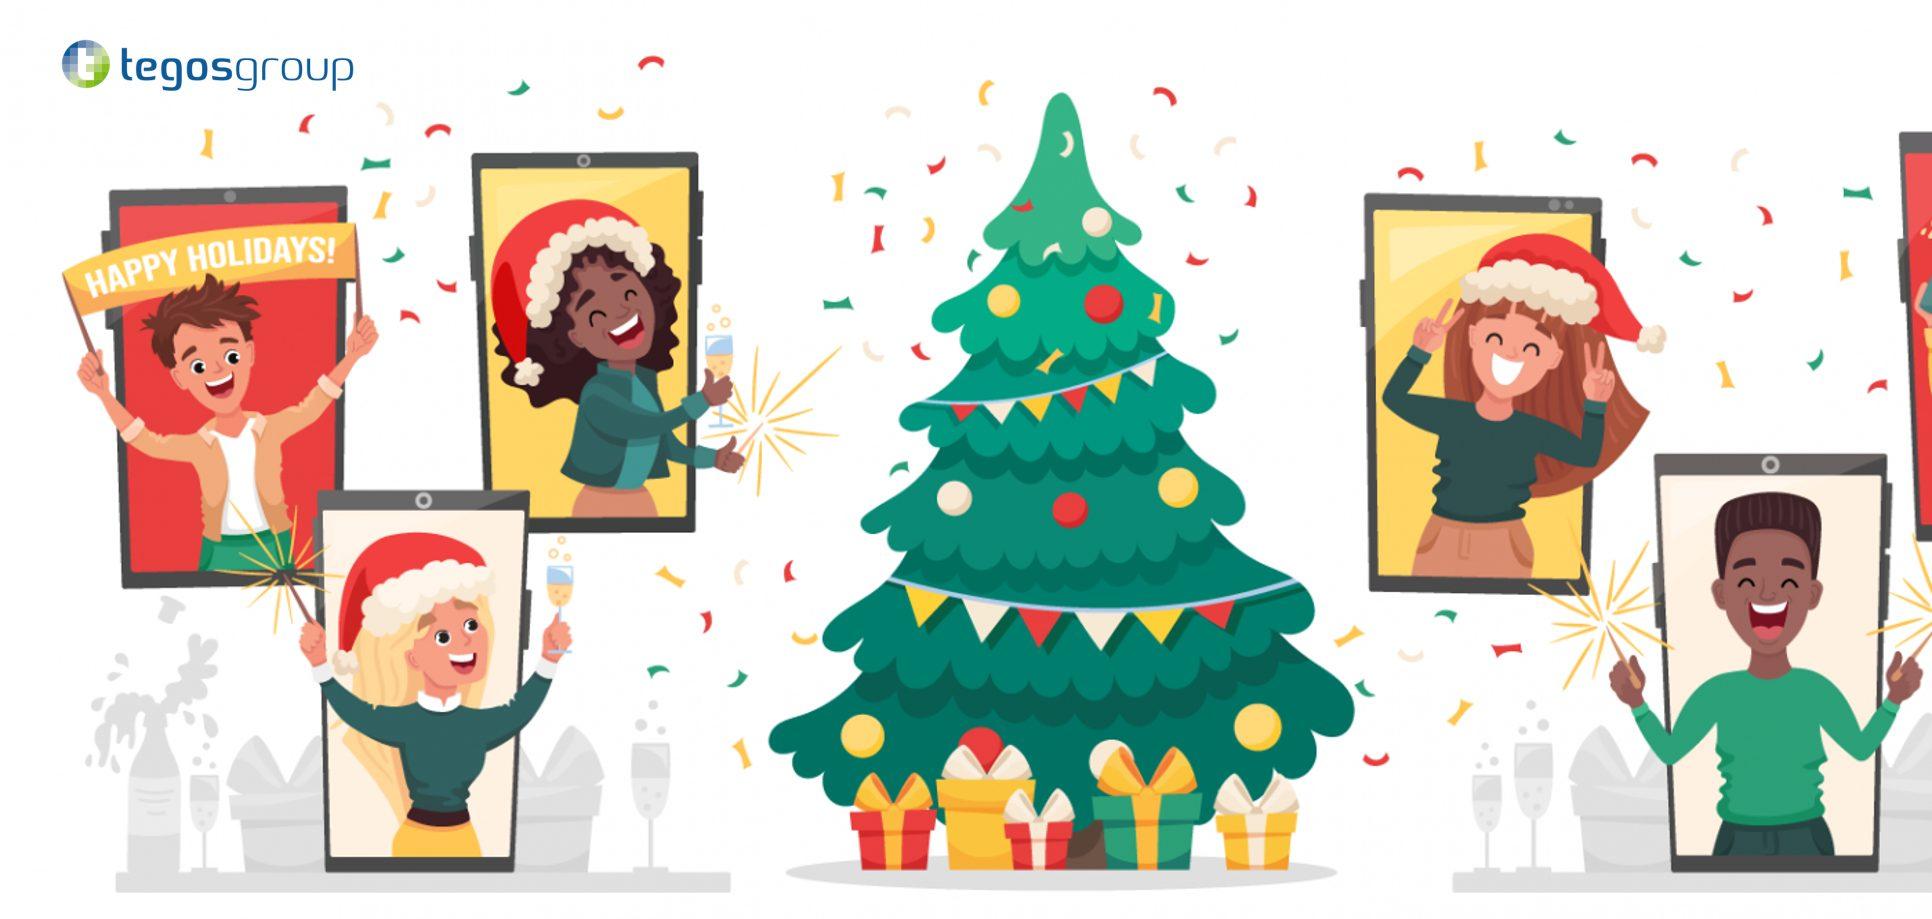 Virtuelle Weihnachtsfeier tegos 2020